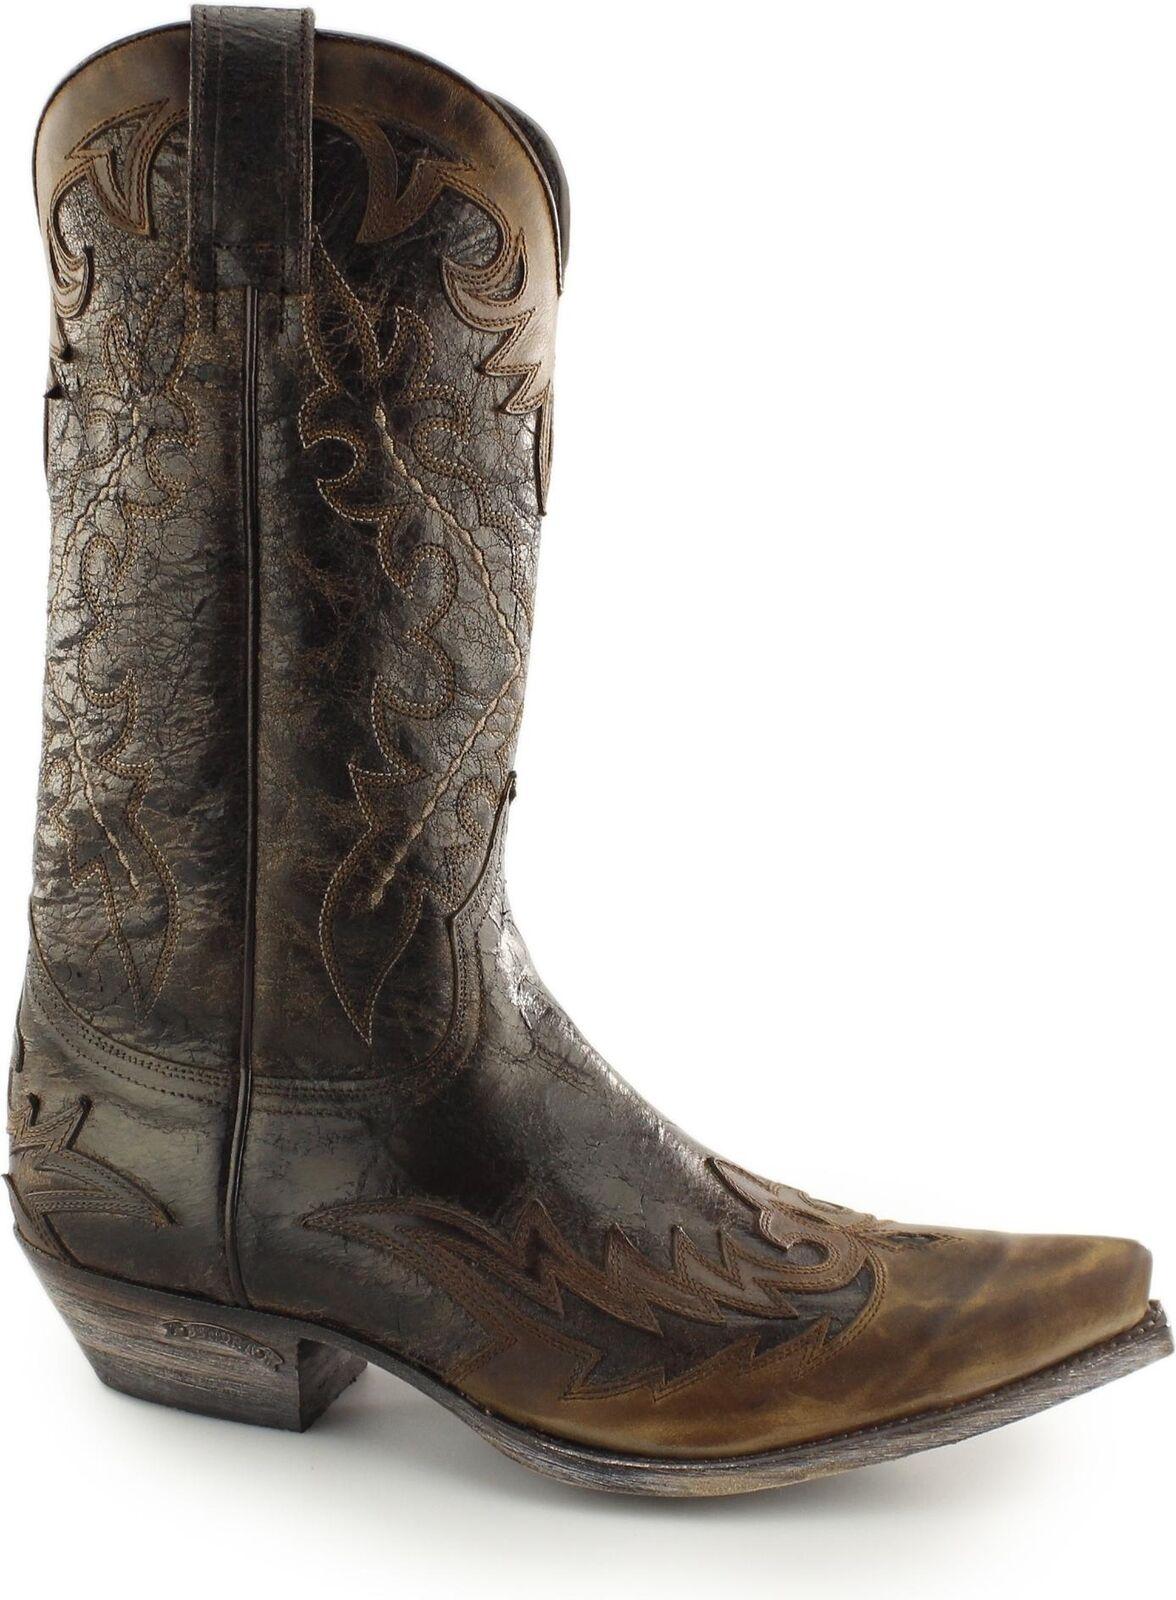 Sendra 9669 Spanish Mens Leather Mid Calf Cowboy Western Boots Flota Brown Tan